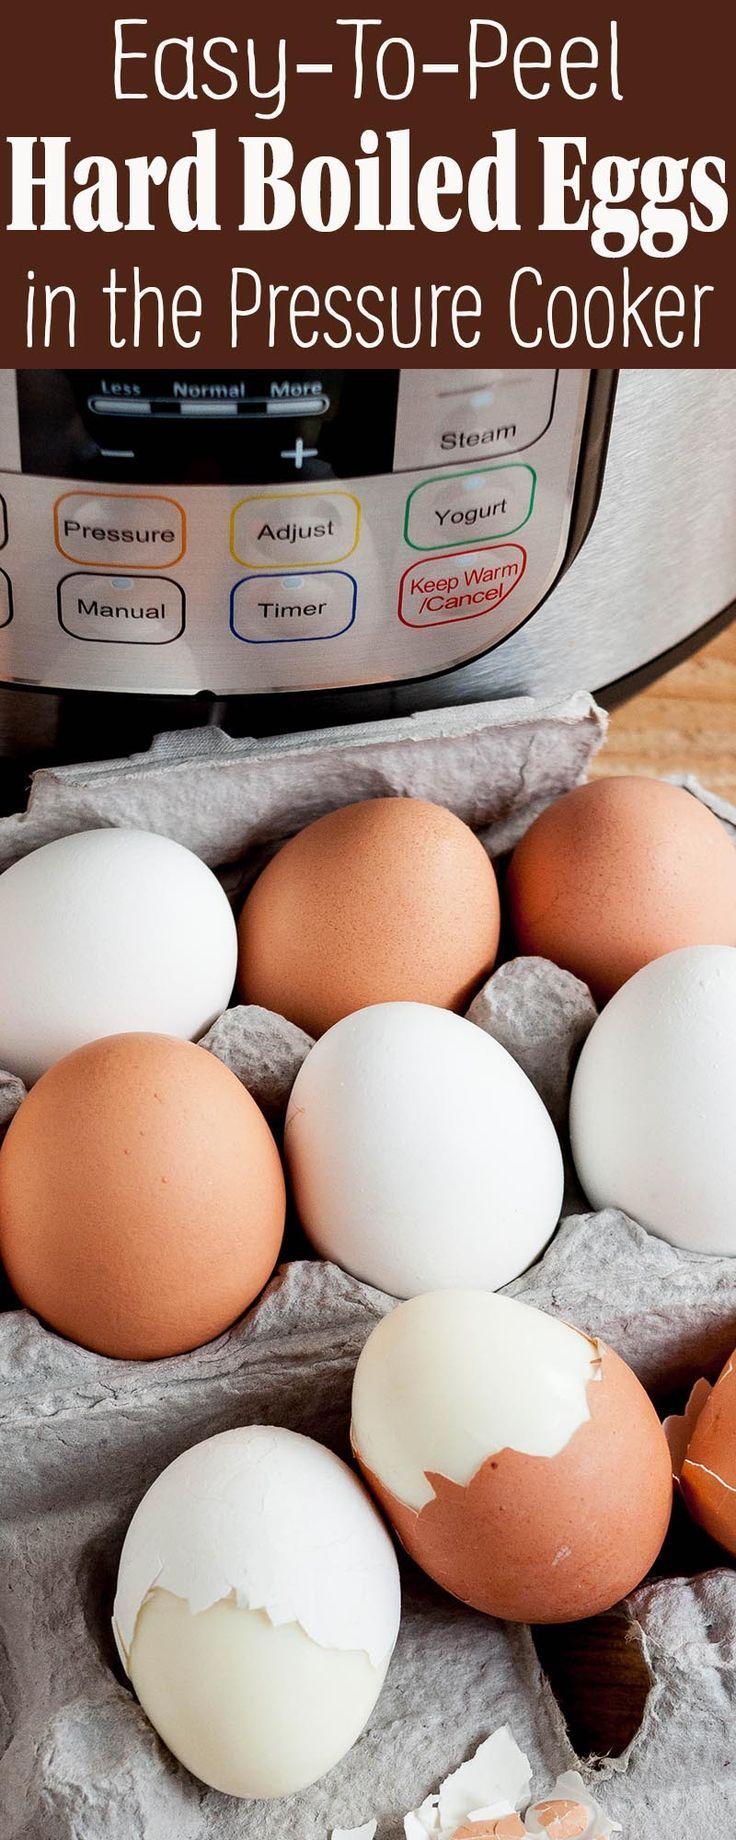 Instant Pot Easy-Peel Hard Boiled Eggs | SimplyRecipes.com